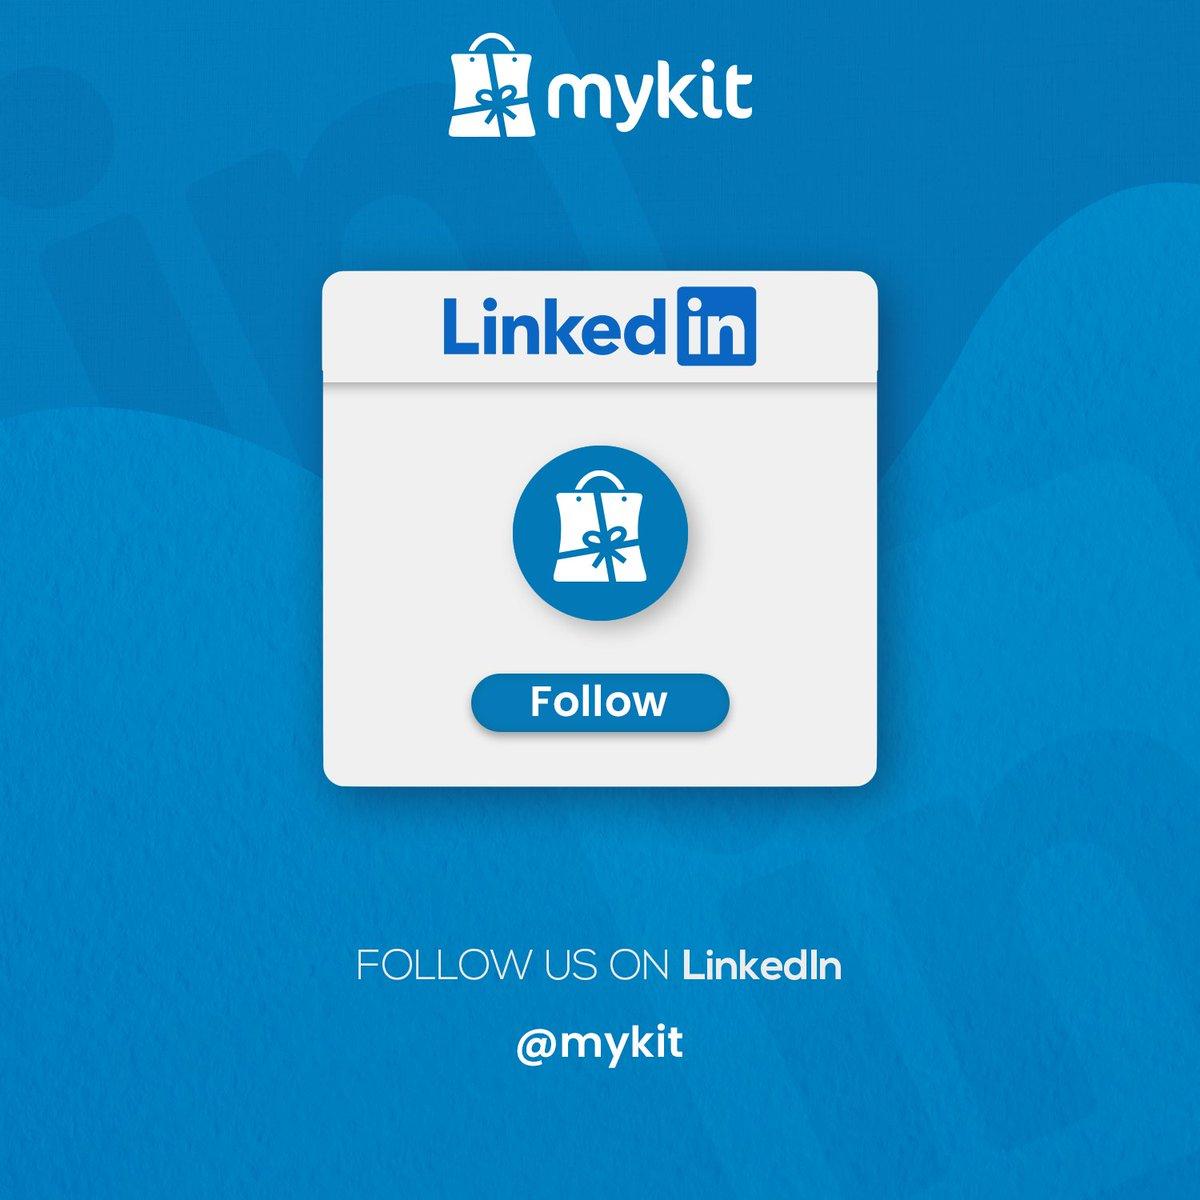 Stay connected...Stay updated... #mykitcart #mykit #follow #followus #onlineshopping #brandyourhome #kannur #kerala https://t.co/LW62dWbXs5